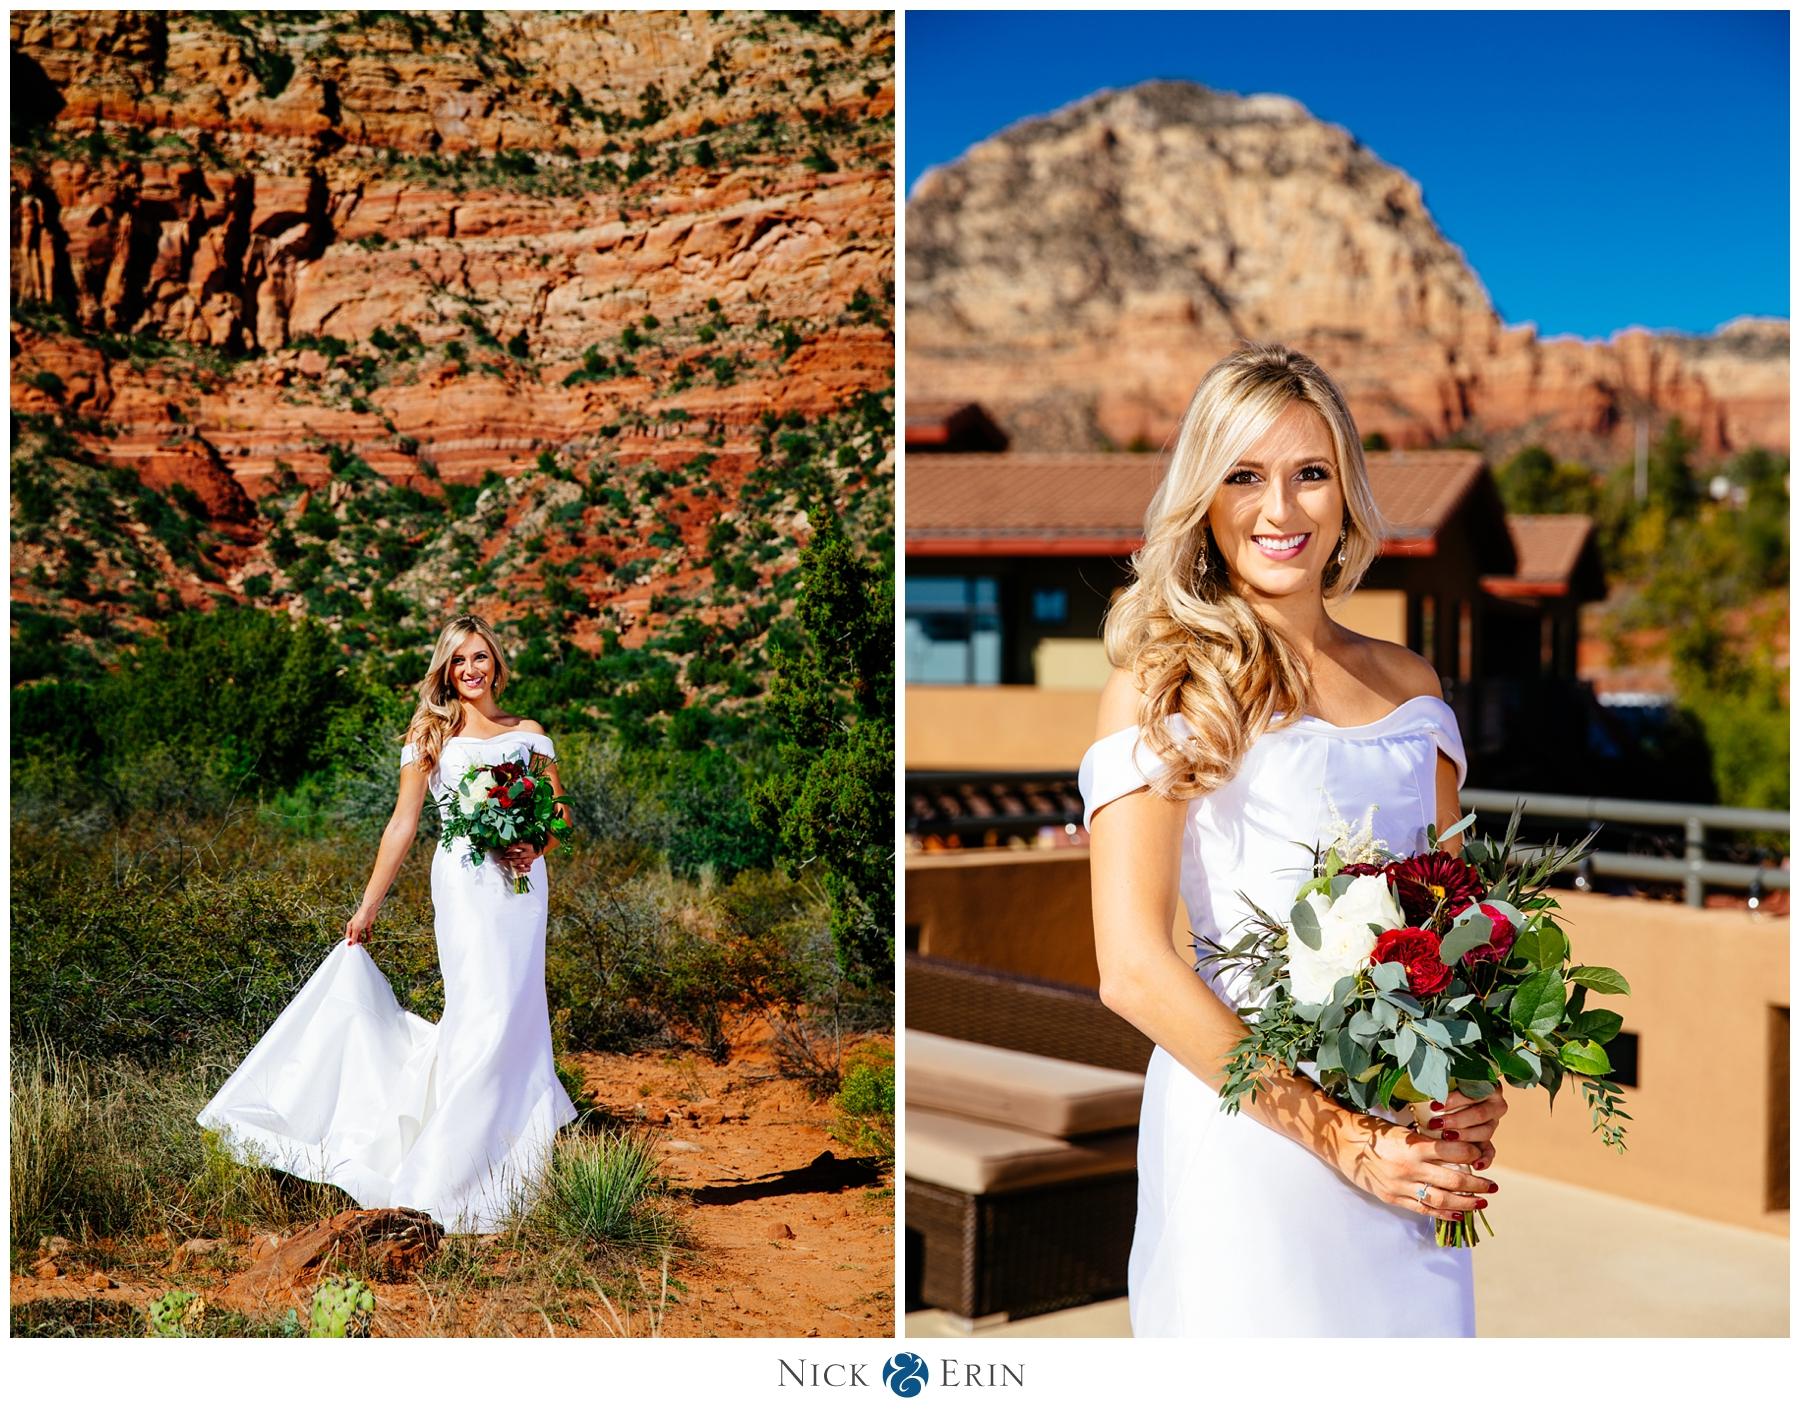 Donner_Photography_Sedona Arizona Wedding_Alissa and Tom_0009